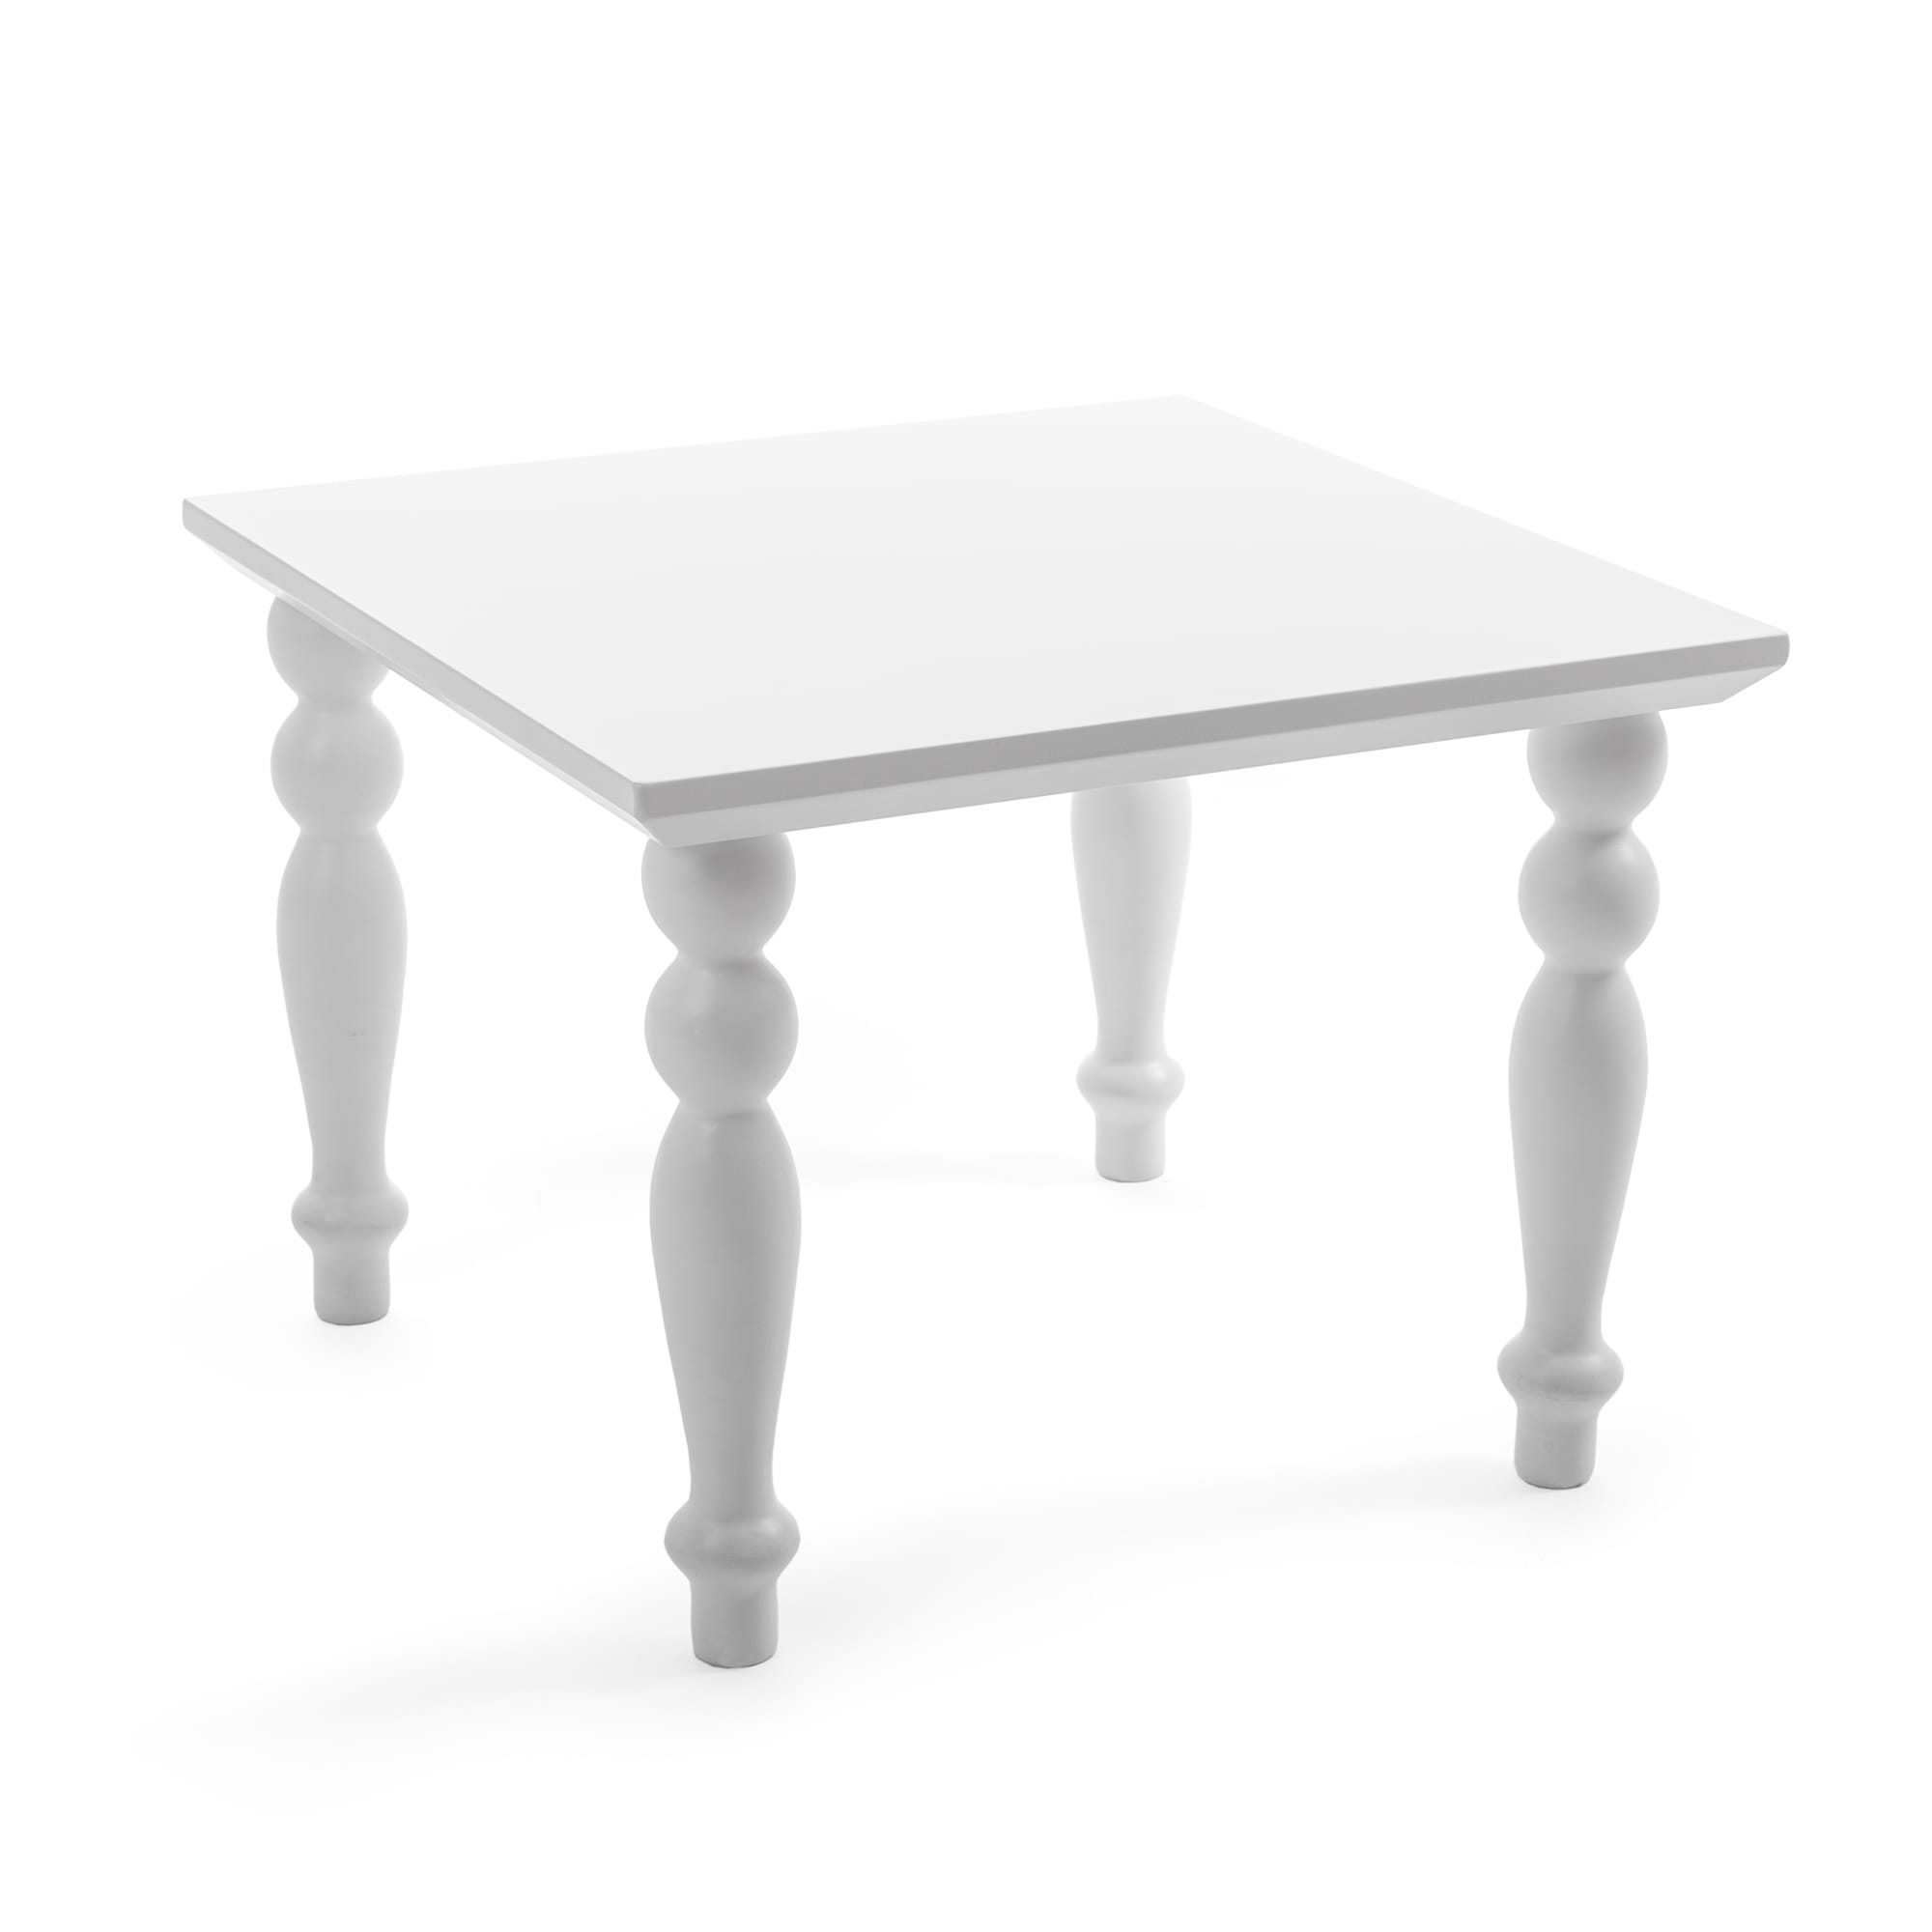 "SELETTI ""HERITAGE"" Armchair Foldable Deckchair Coffee Table"